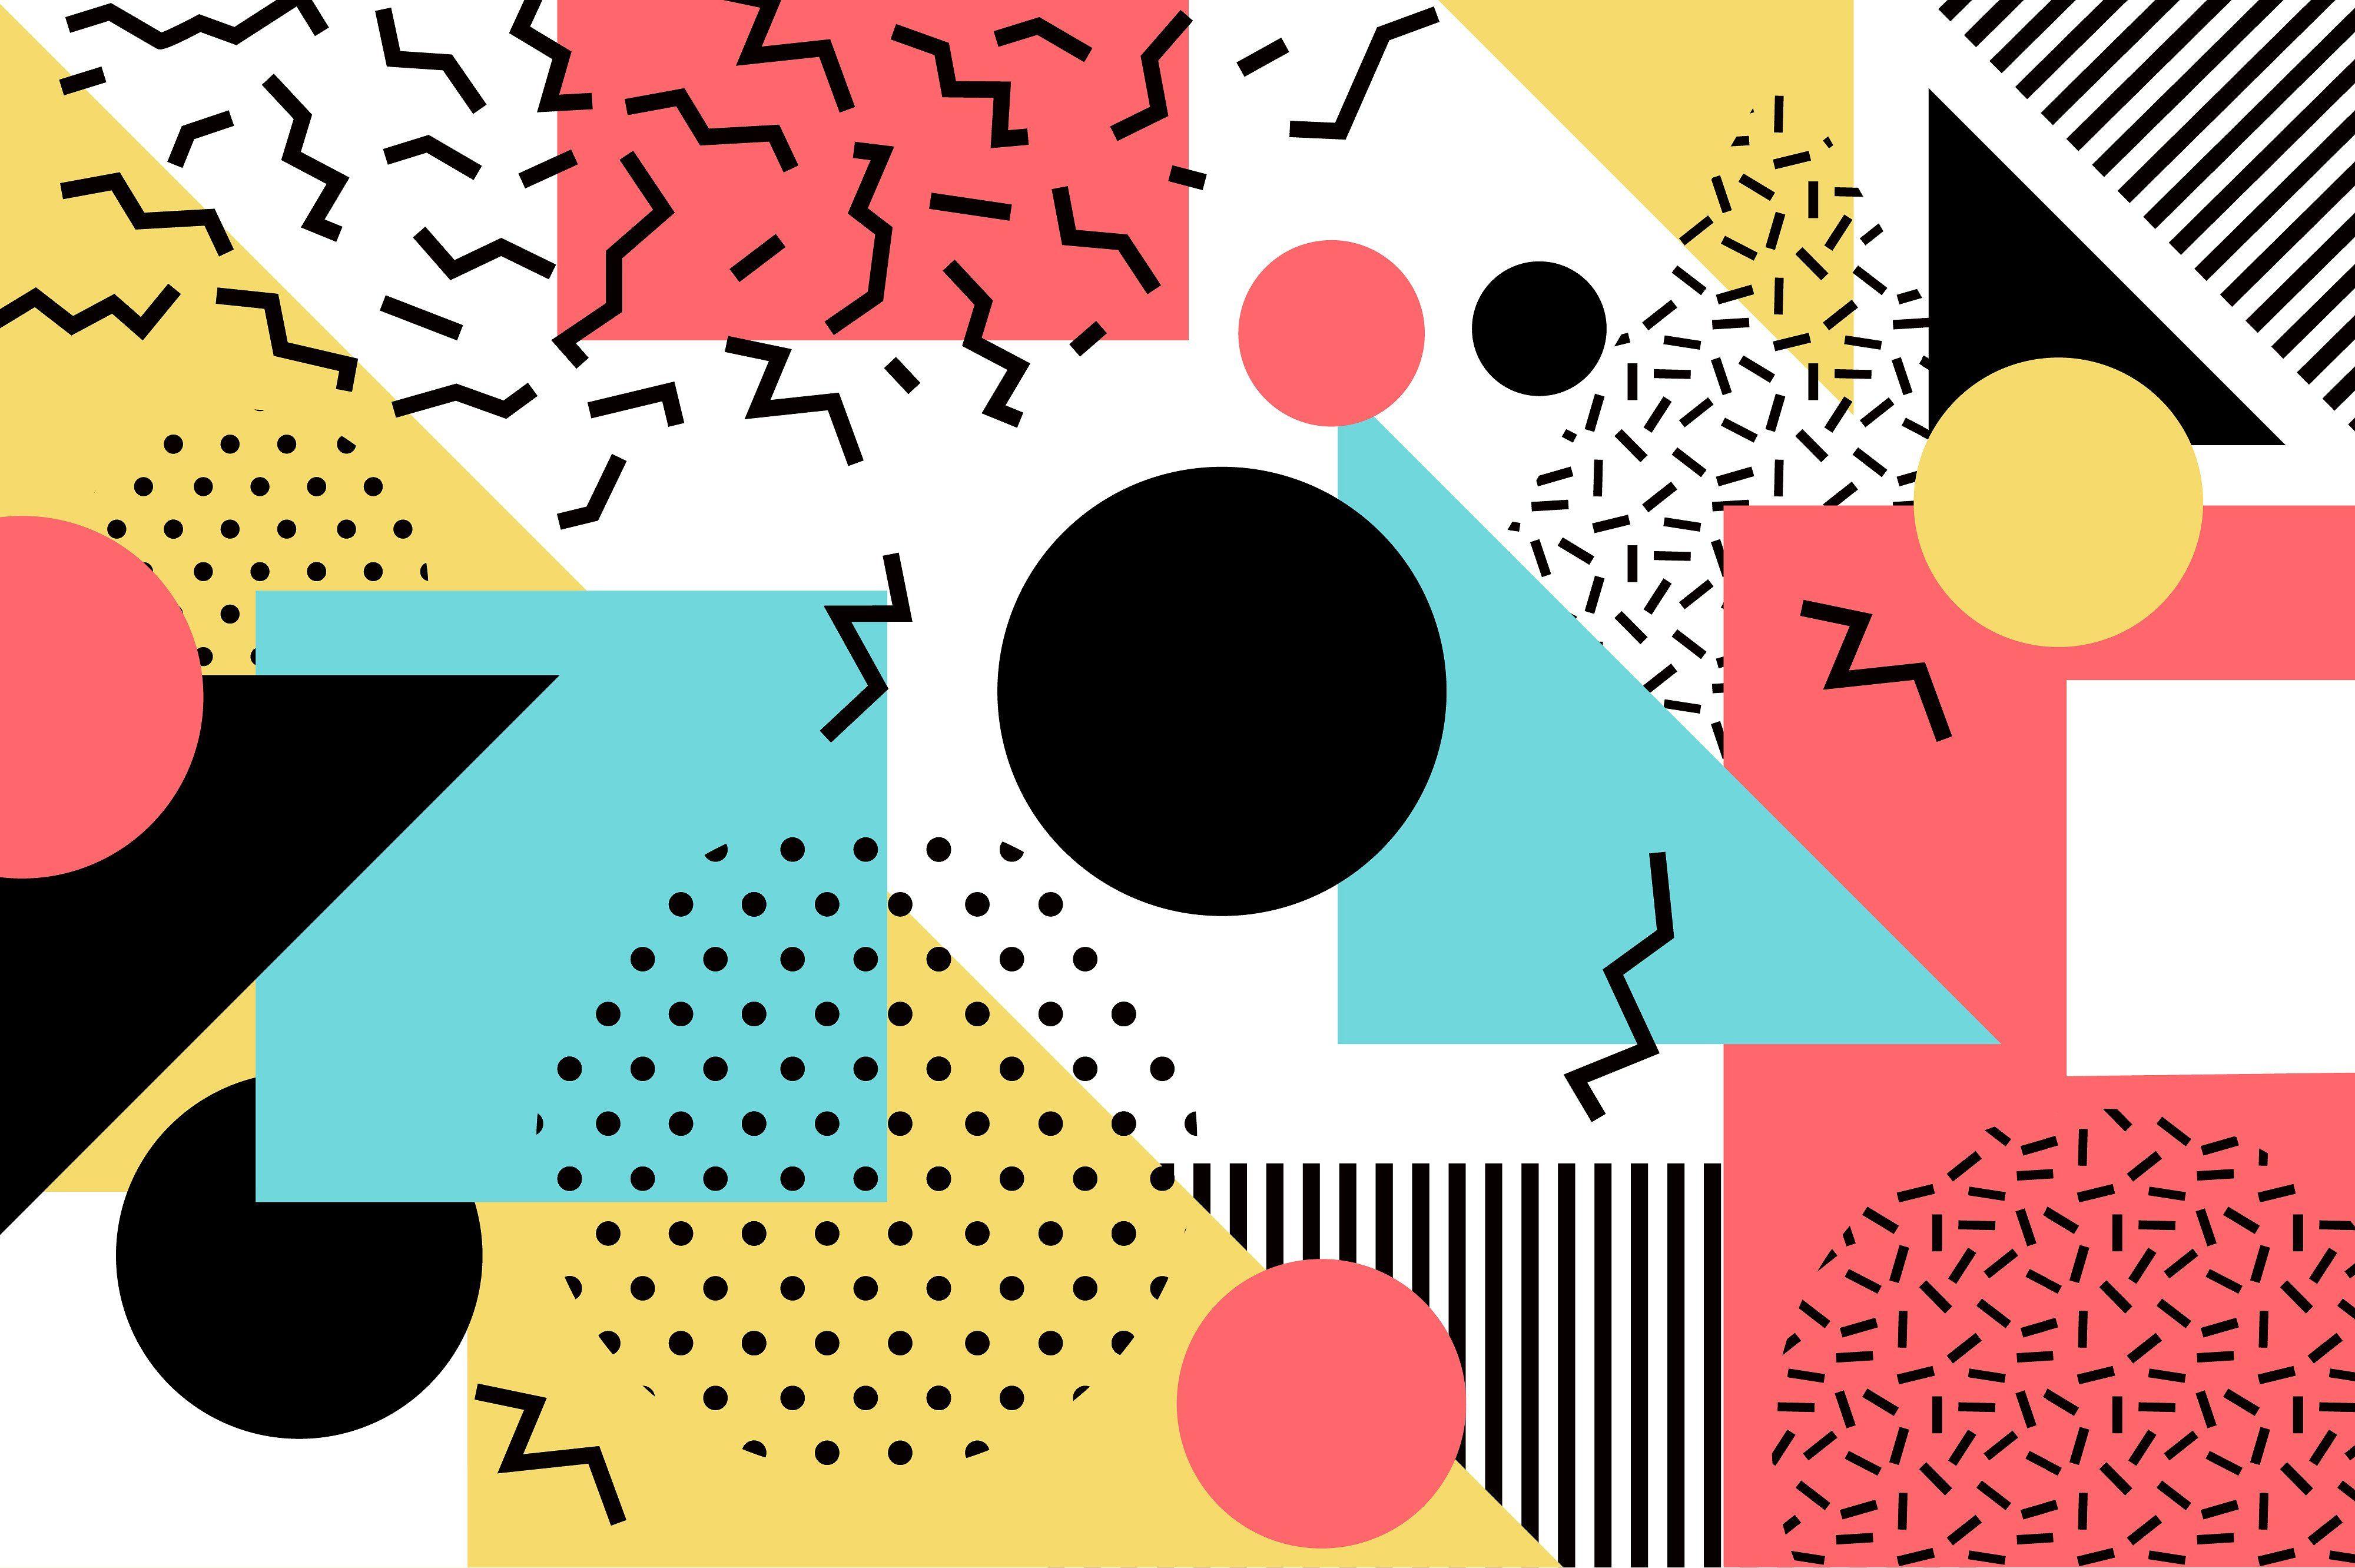 Memphis geometric background by Snita on @creativemarket #memphisdesign